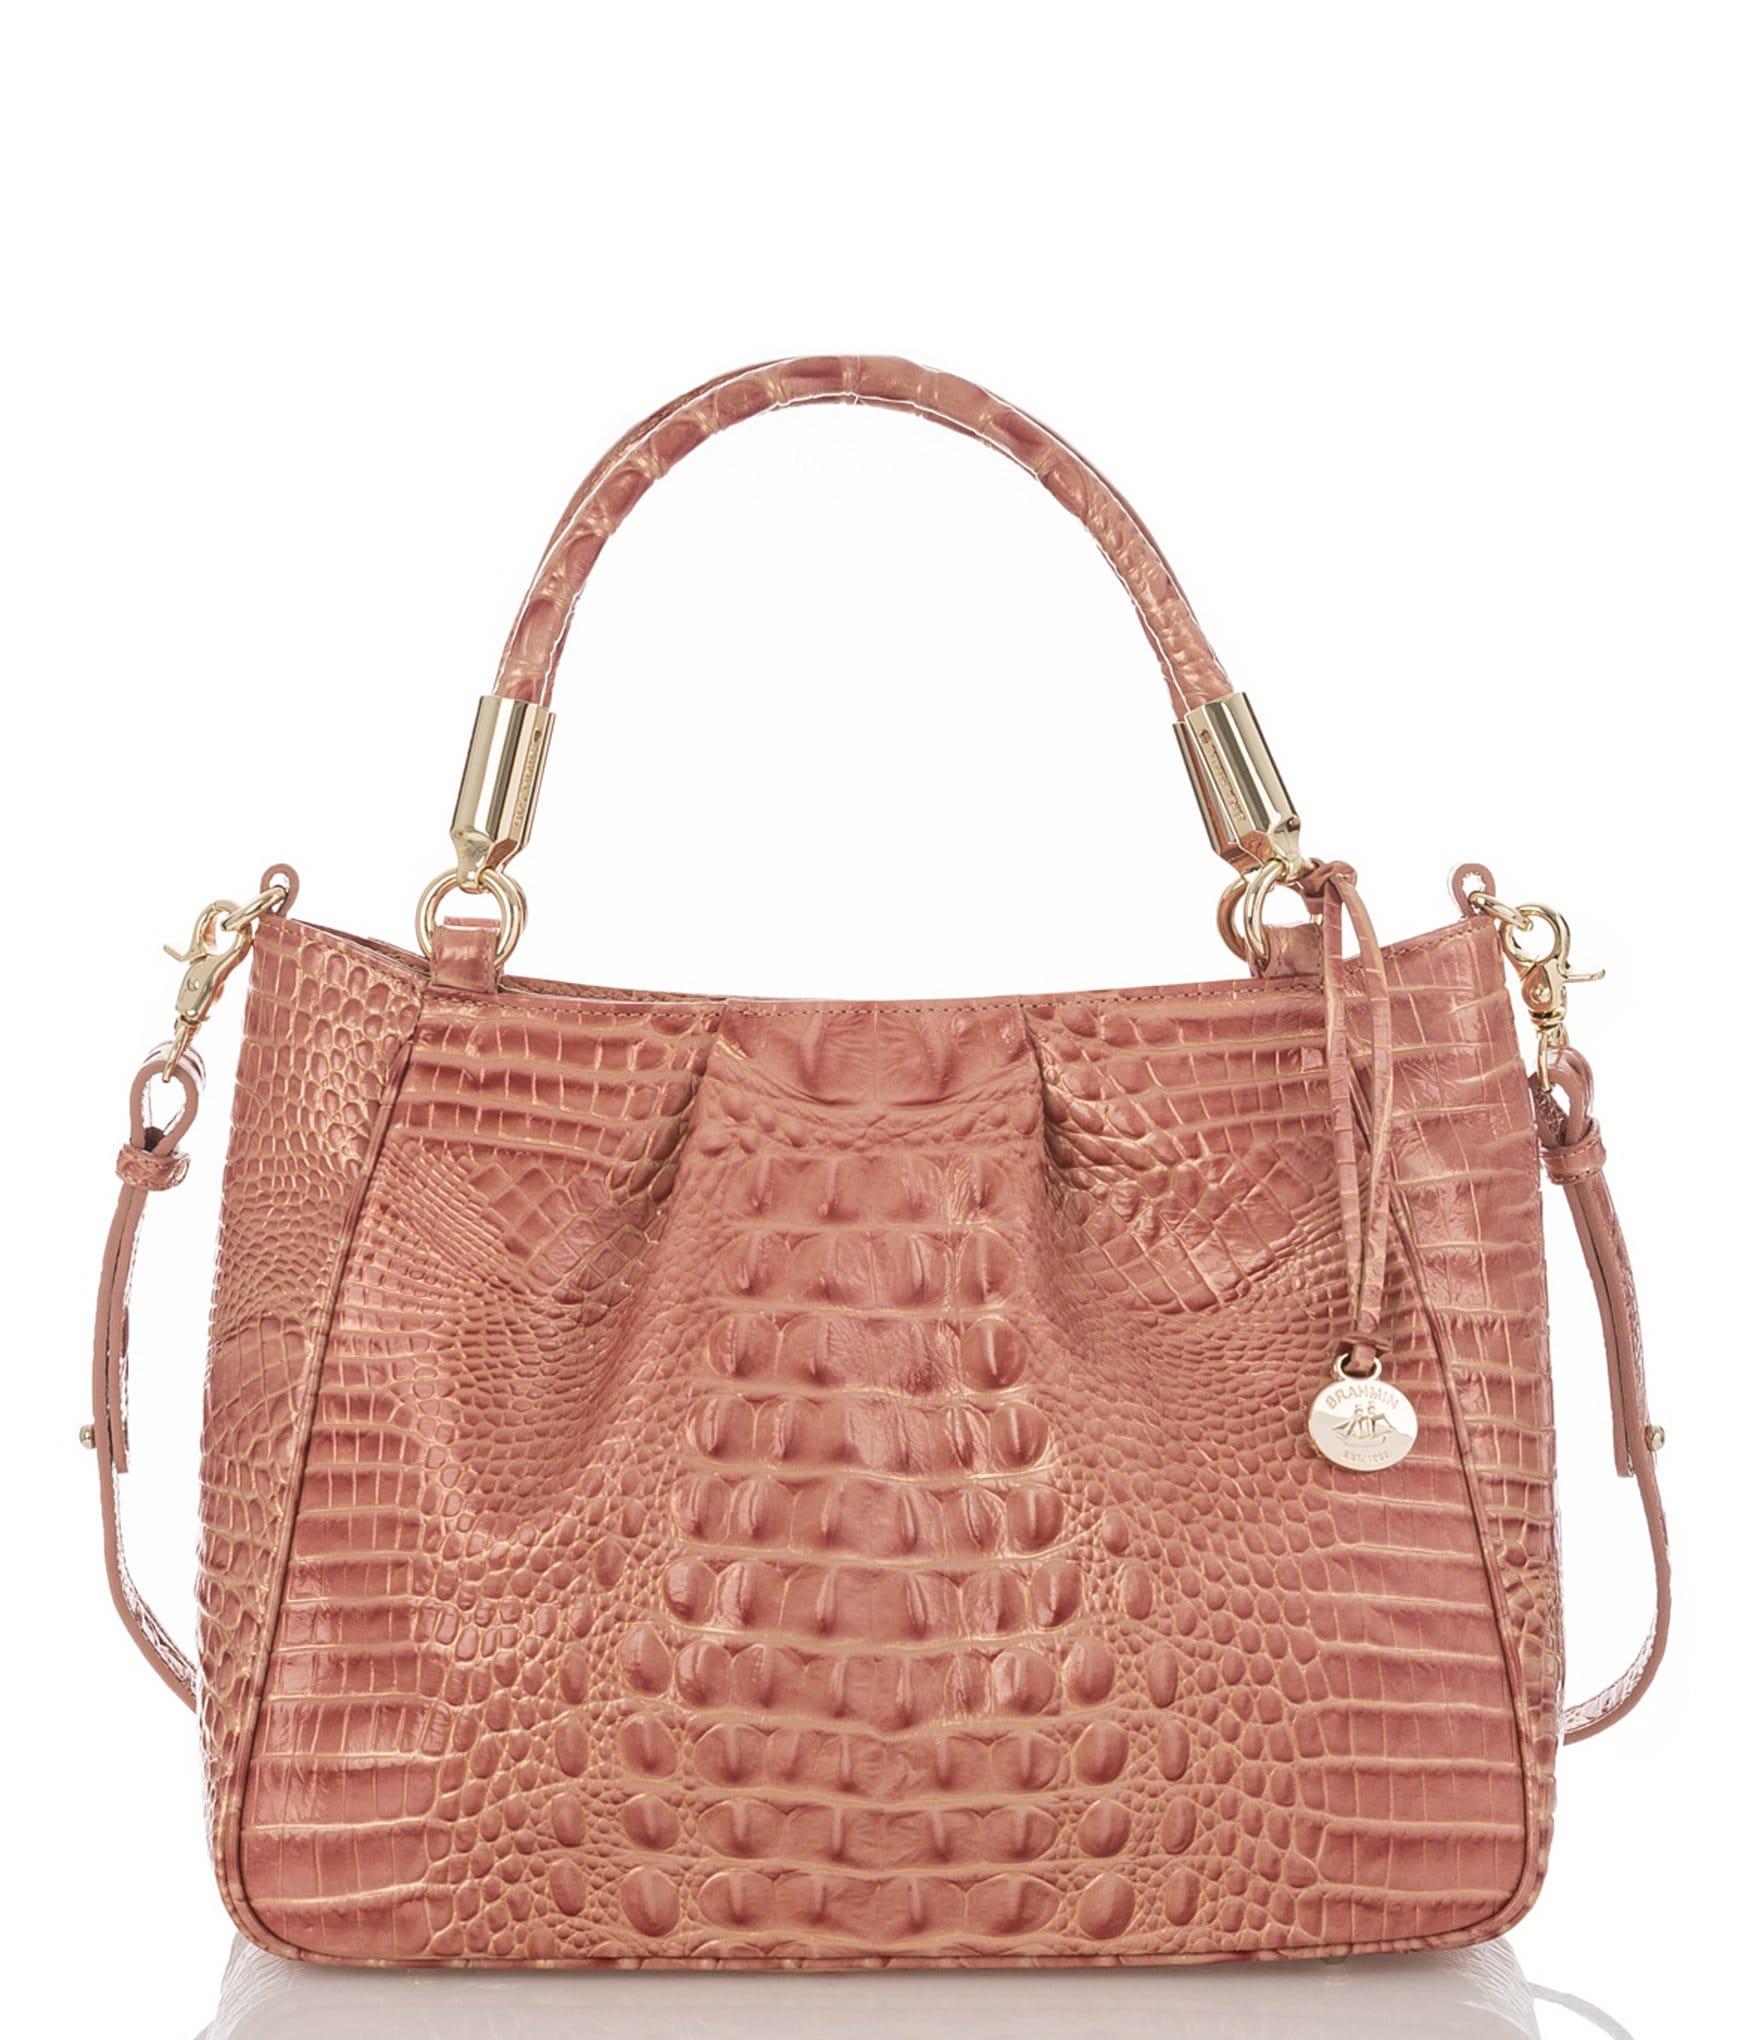 5c81050d72c605 Dillards Brahmin Handbags On Sale | Stanford Center for Opportunity ...